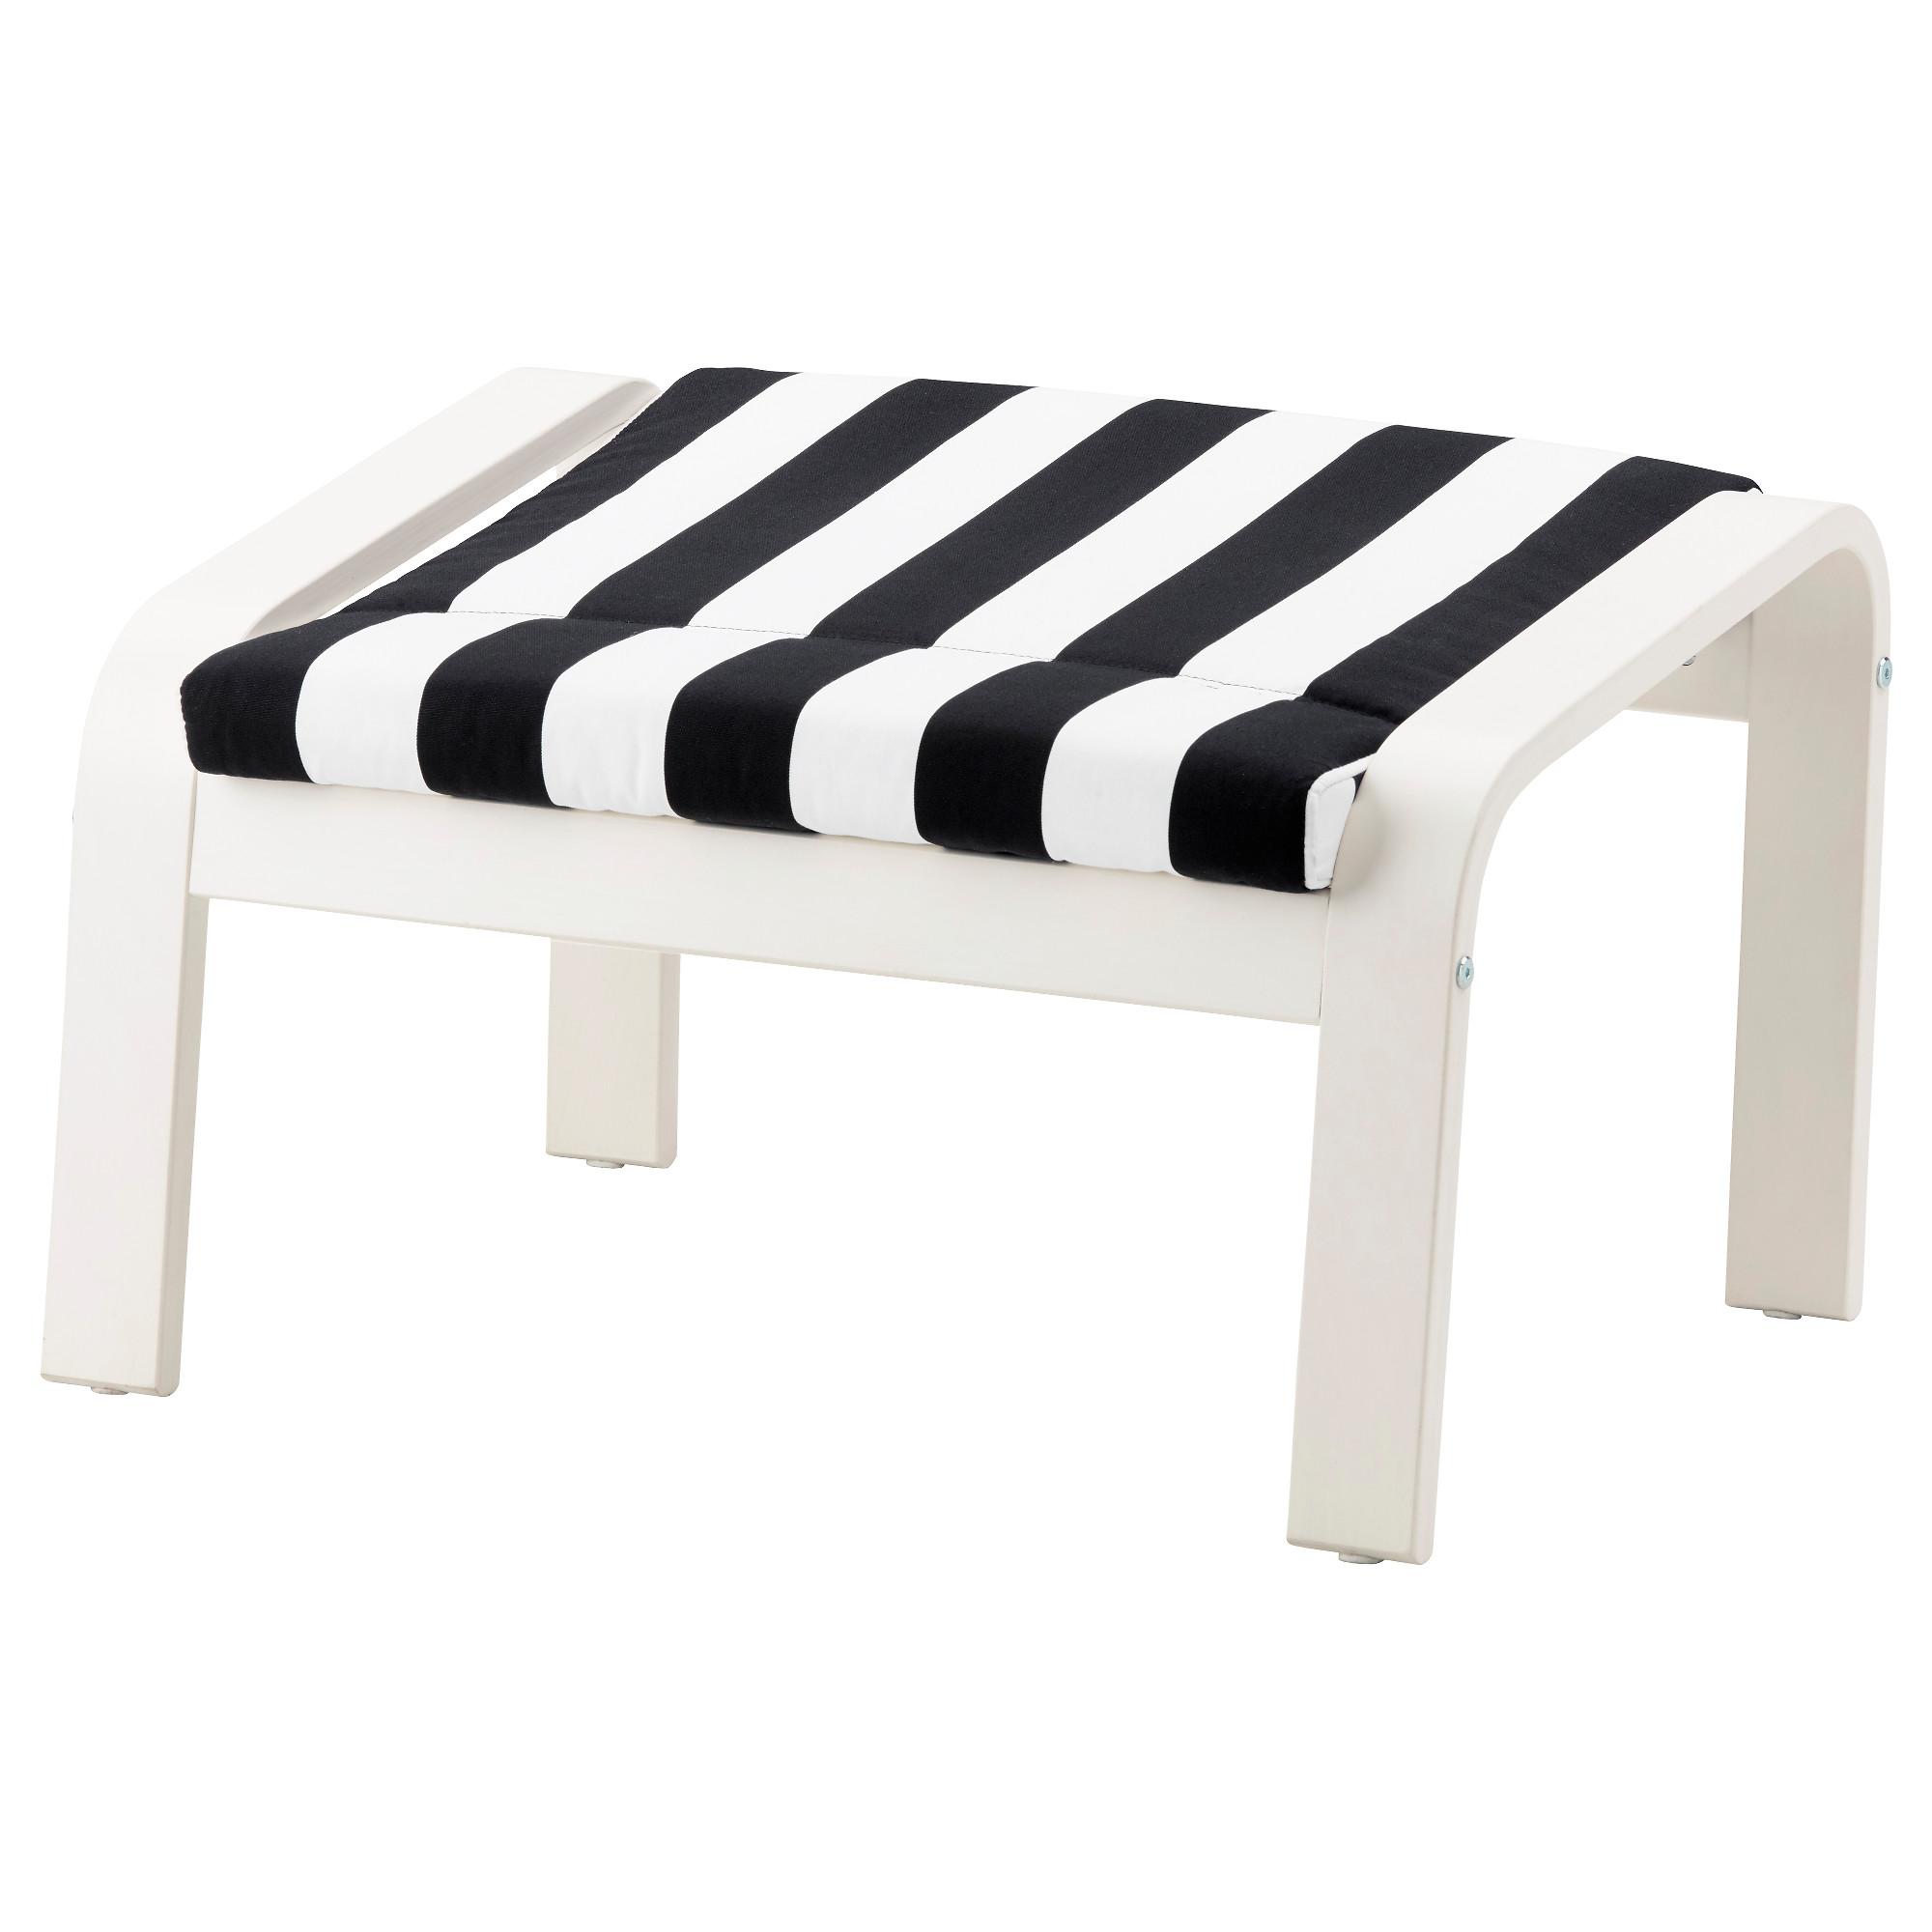 Табурет для ног ПОЭНГ черный/белый артикуль № 692.515.62 в наличии. Онлайн сайт IKEA Беларусь. Недорогая доставка и монтаж.